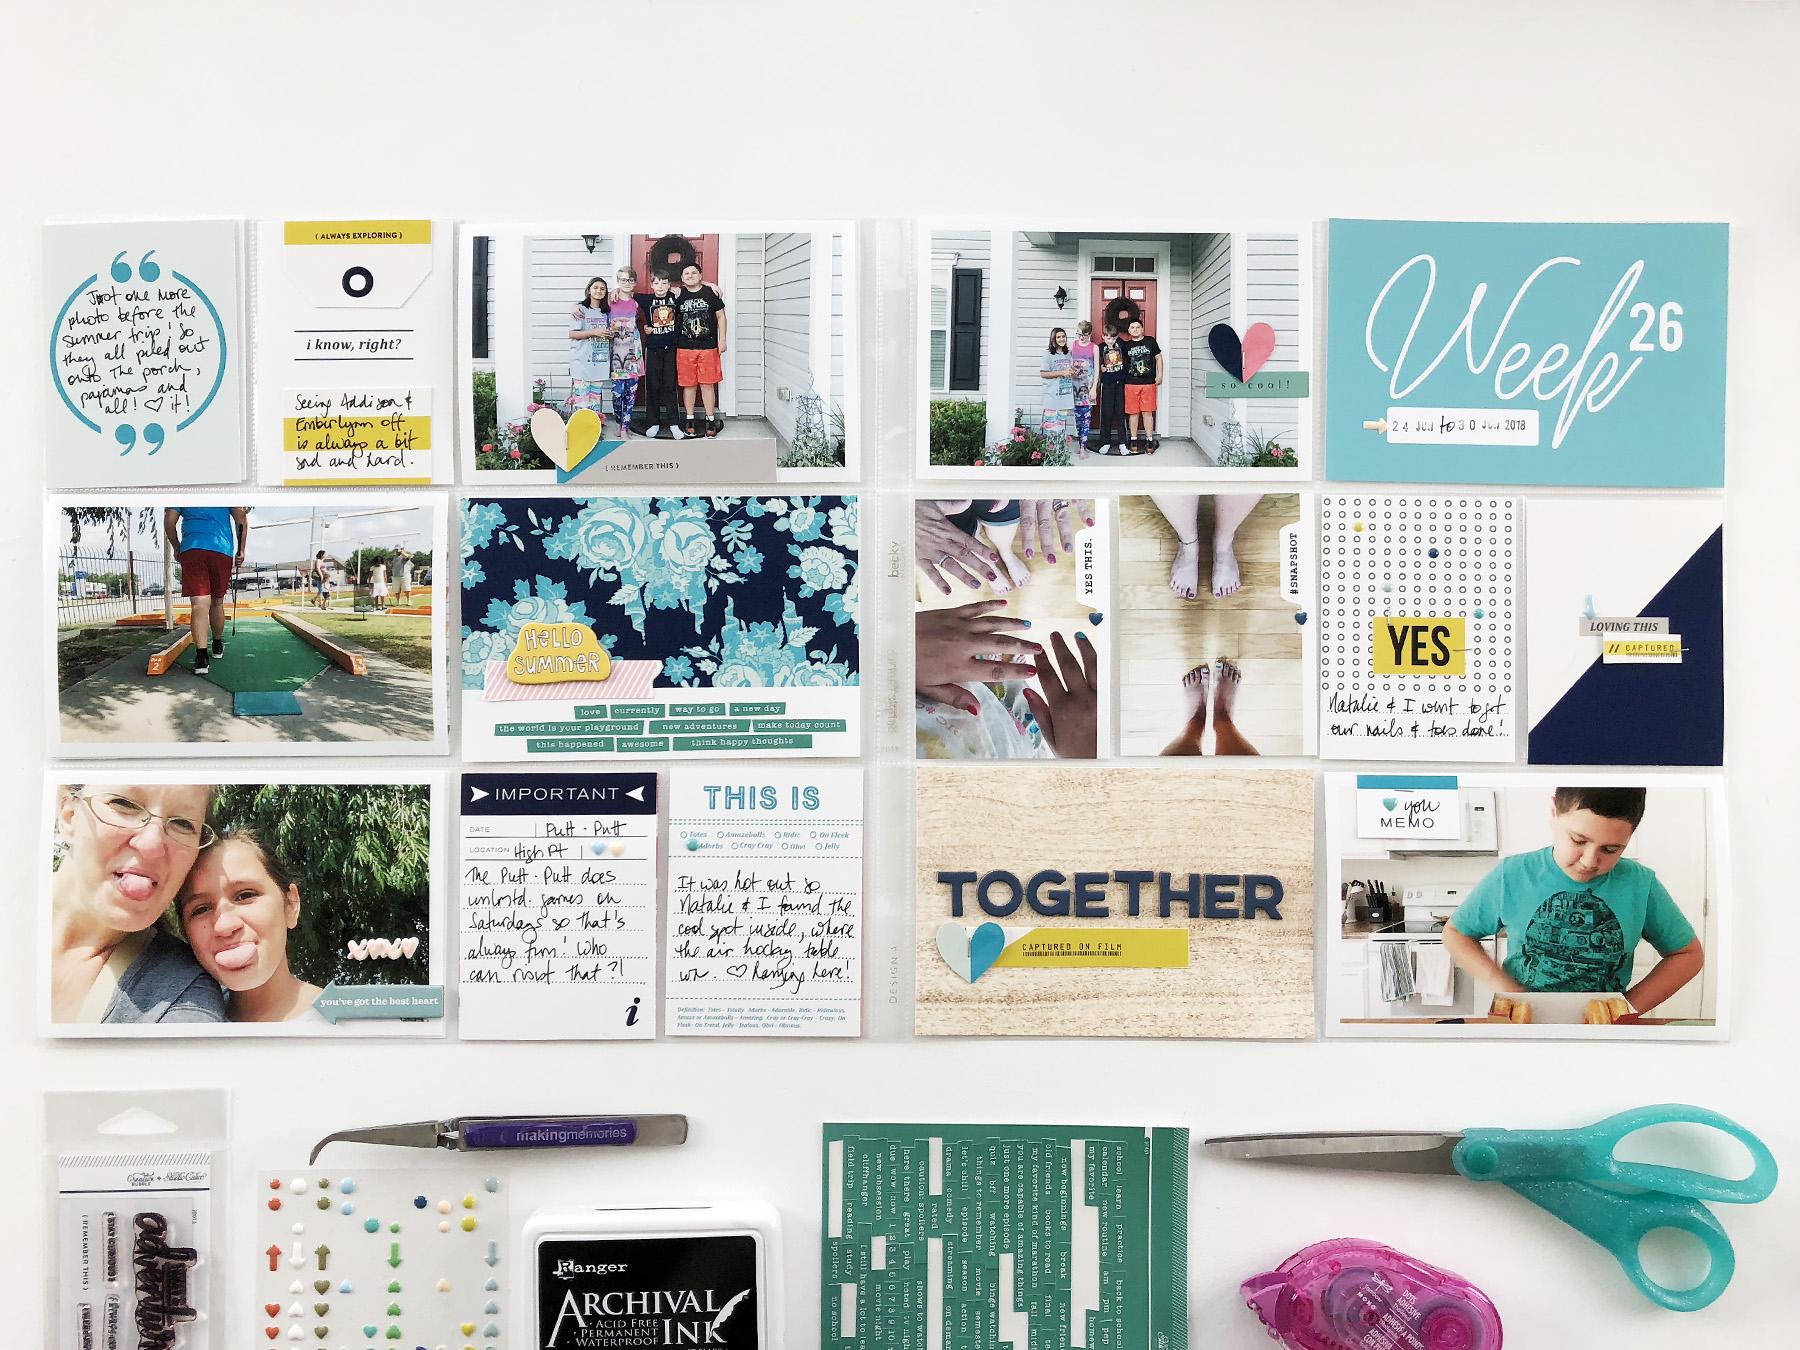 Project Life 2018 Week 26 | ft. Sahlin Studio Snapshot Photo Templates